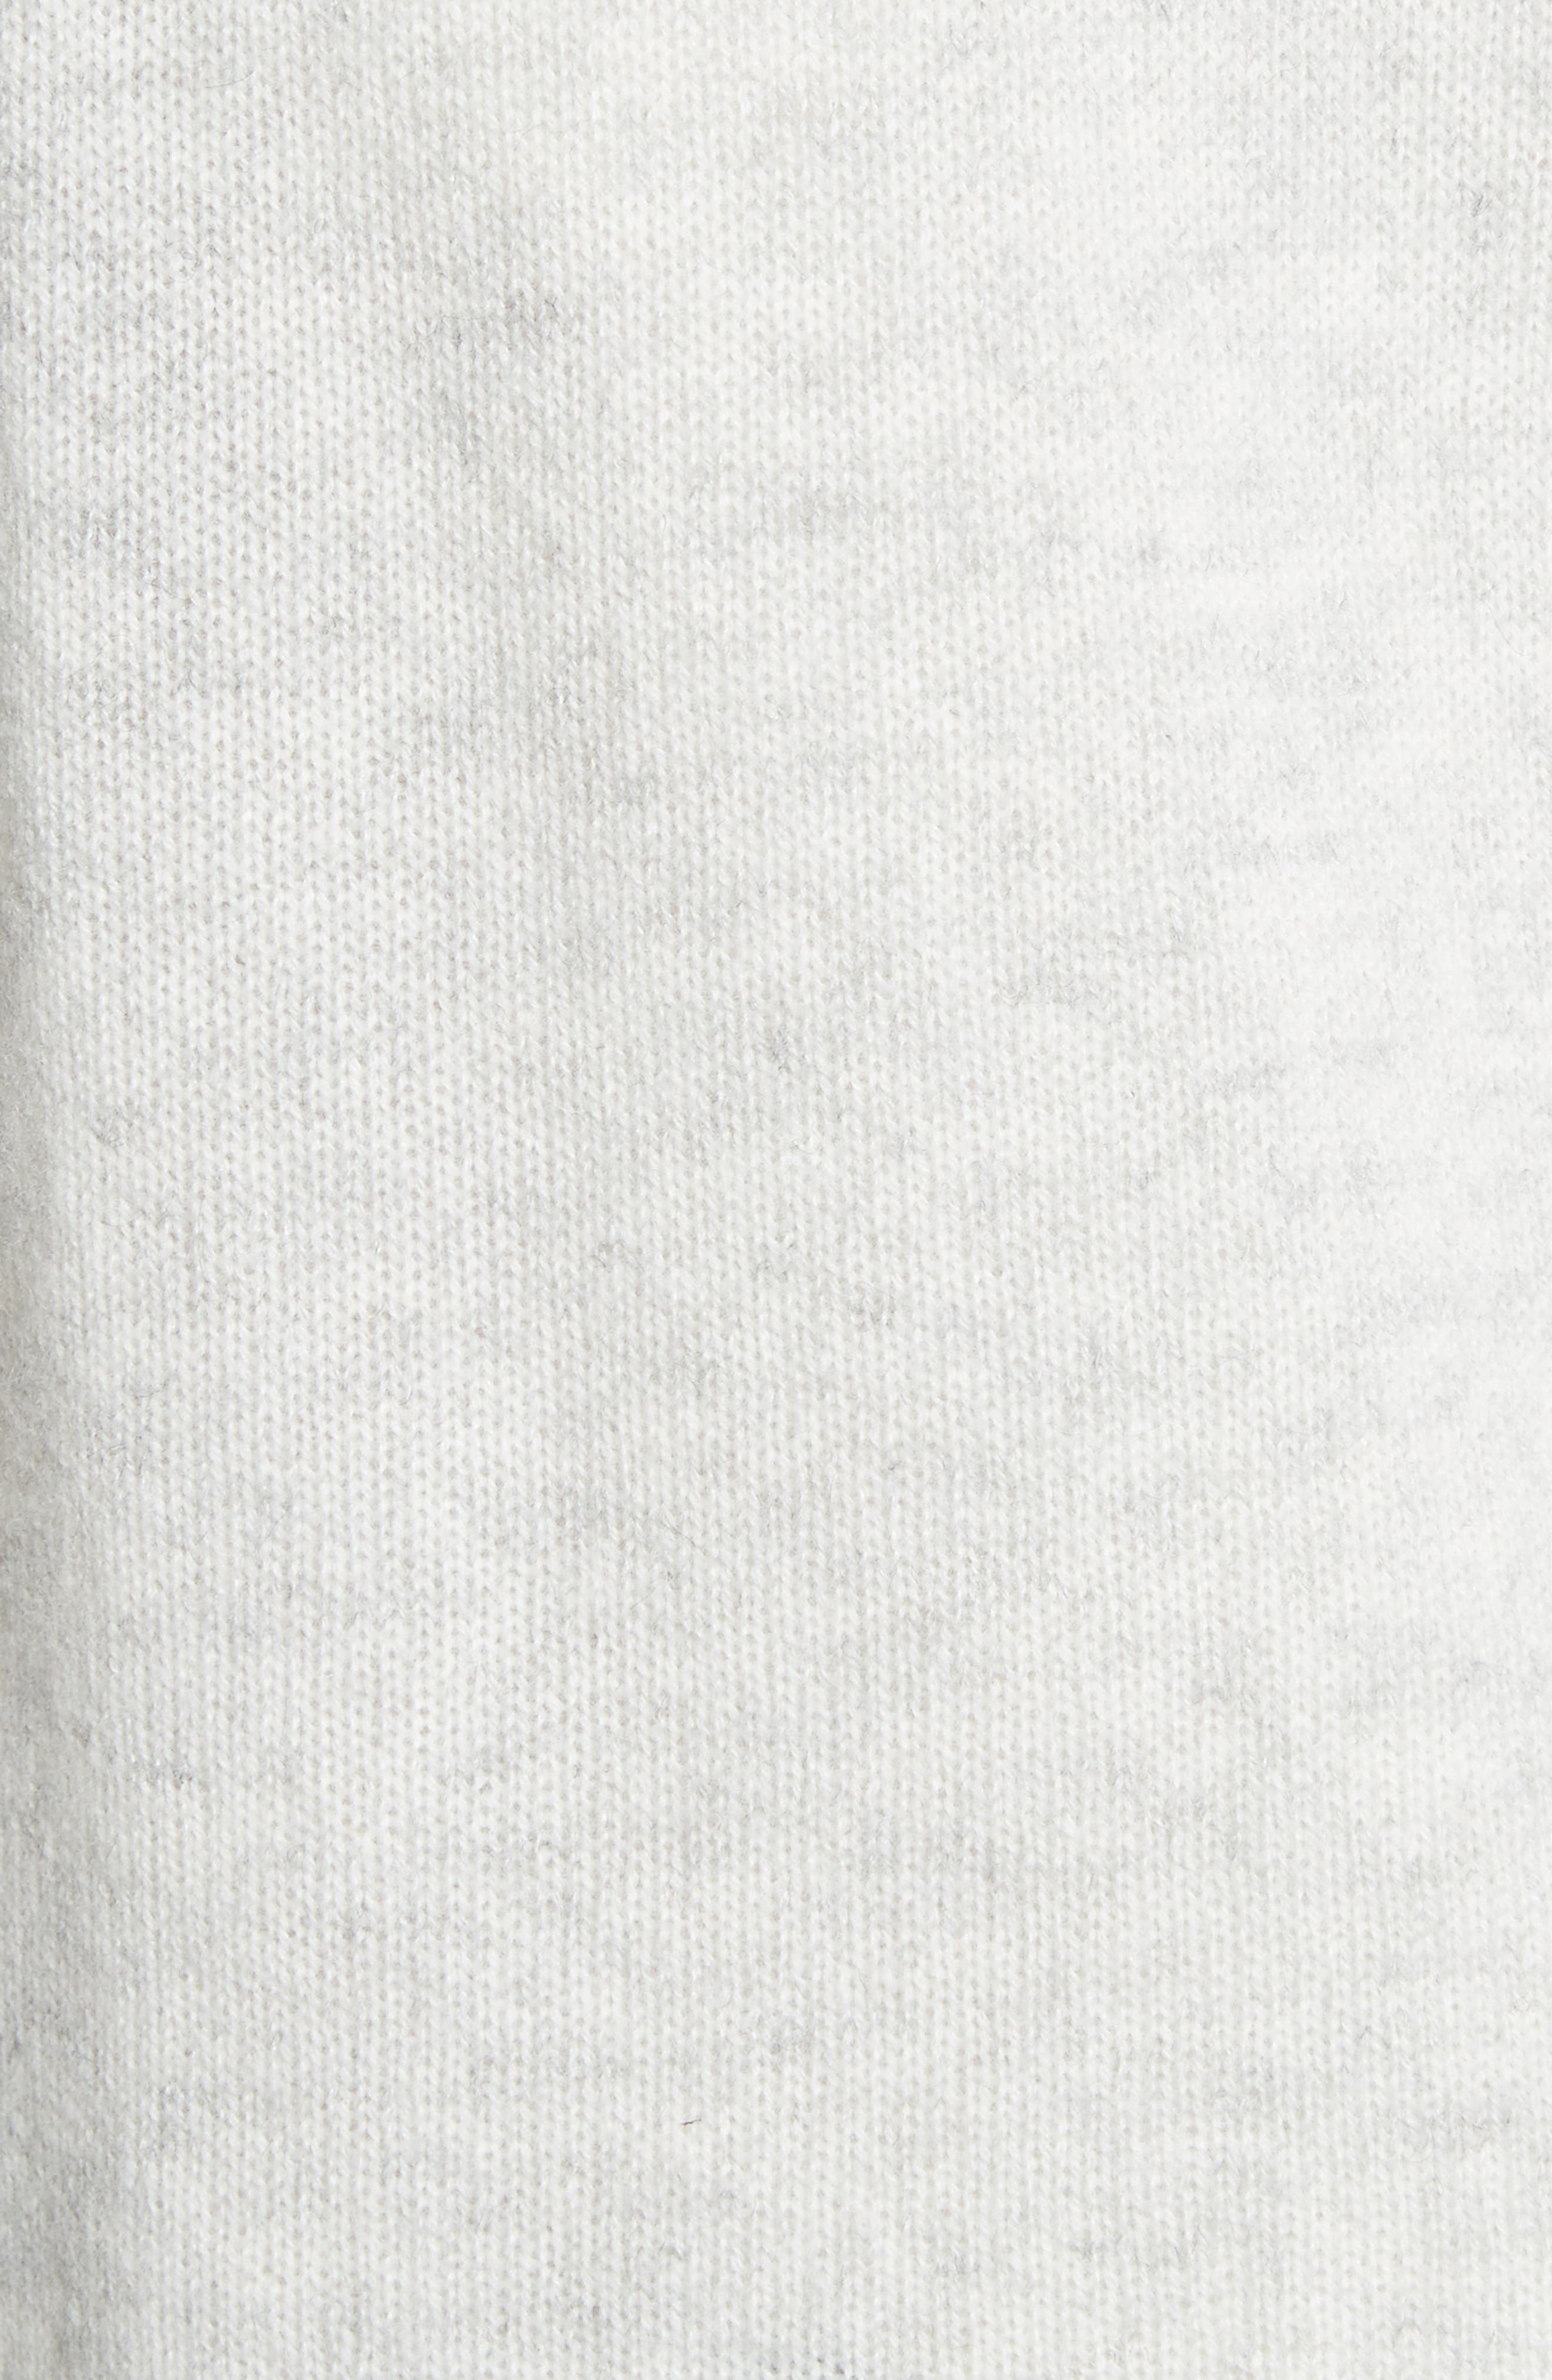 Doral Cashmere Cardigan,                             Alternate thumbnail 5, color,                             100